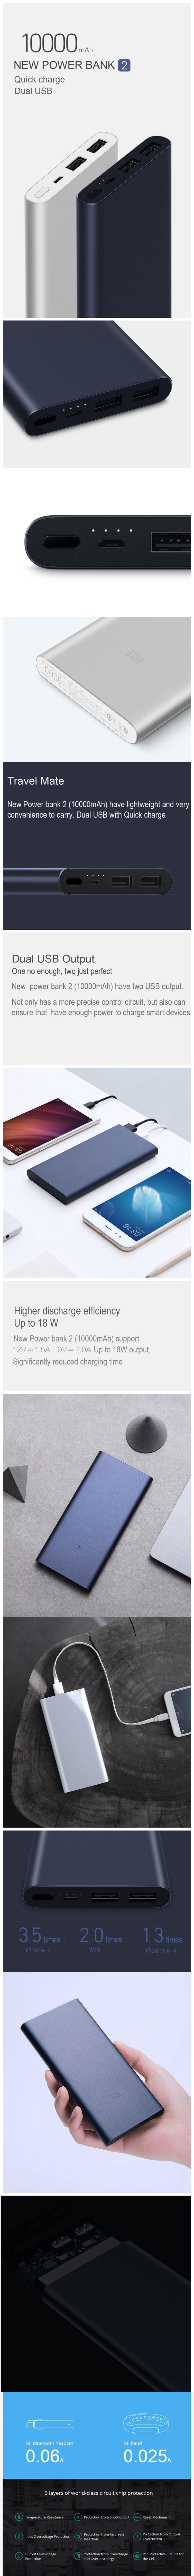 New Xiaomi Mi Power Bank 2 10000mAh Dual USB Quick Charge Portable Battery